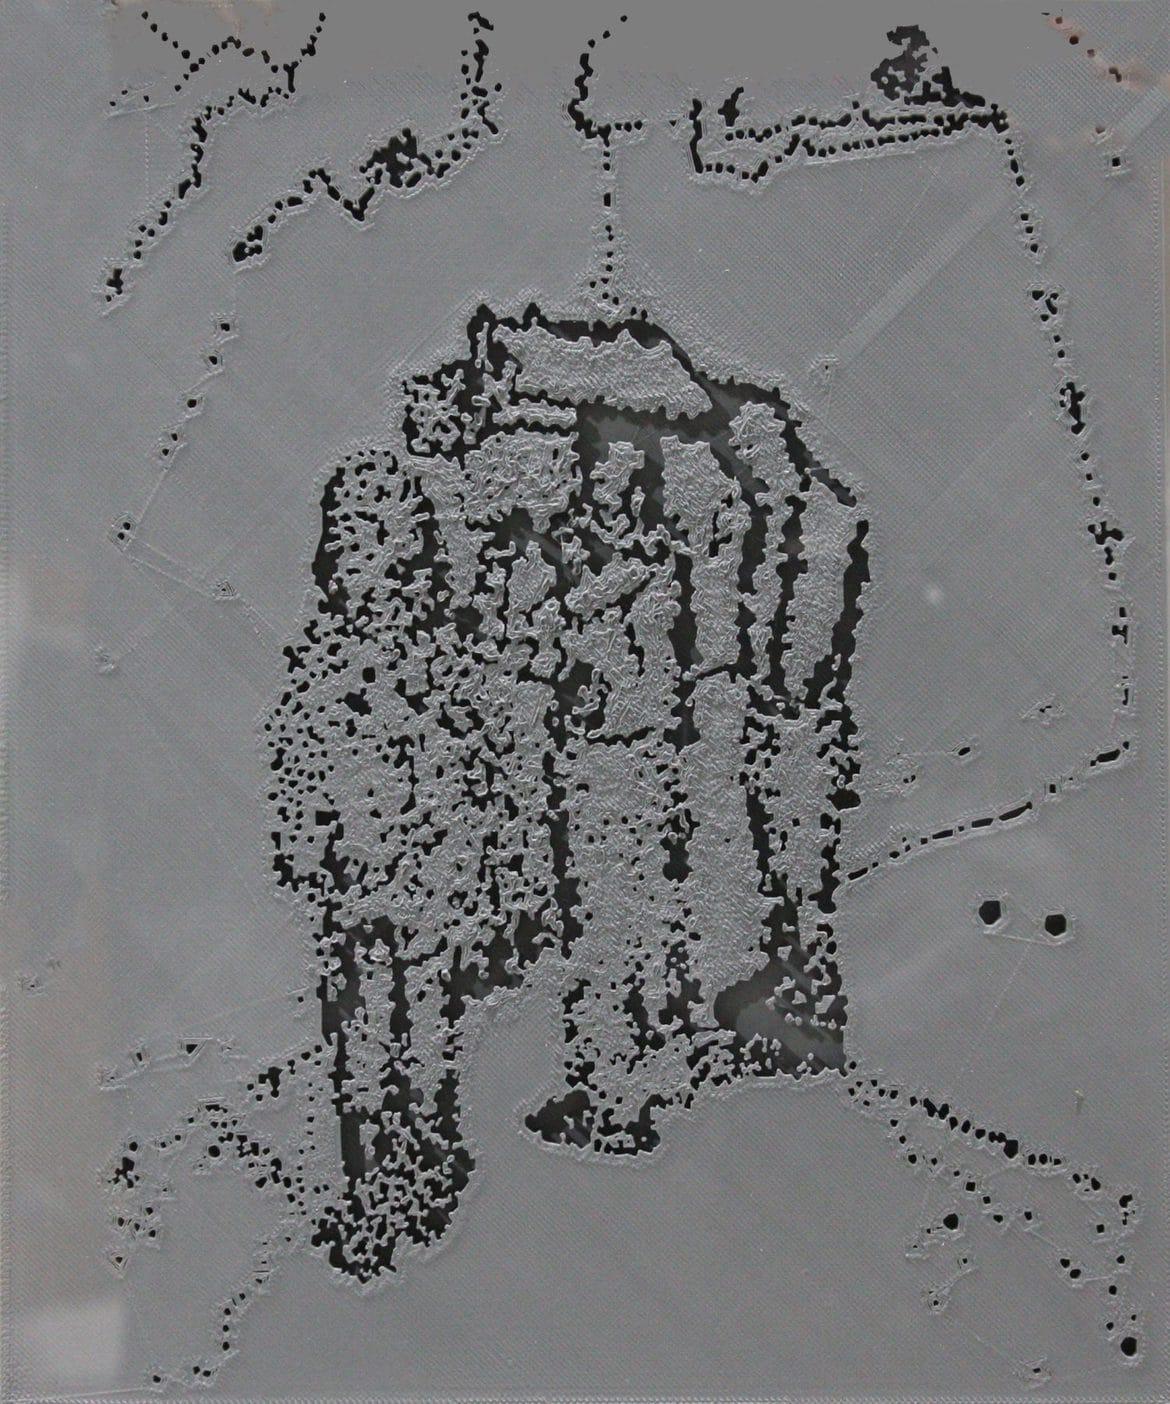 Jon Cattapan, 'Precipice Study I', 2019, 3D print, framed, 37 x 44 cm, edition of 5 + 1 A.P